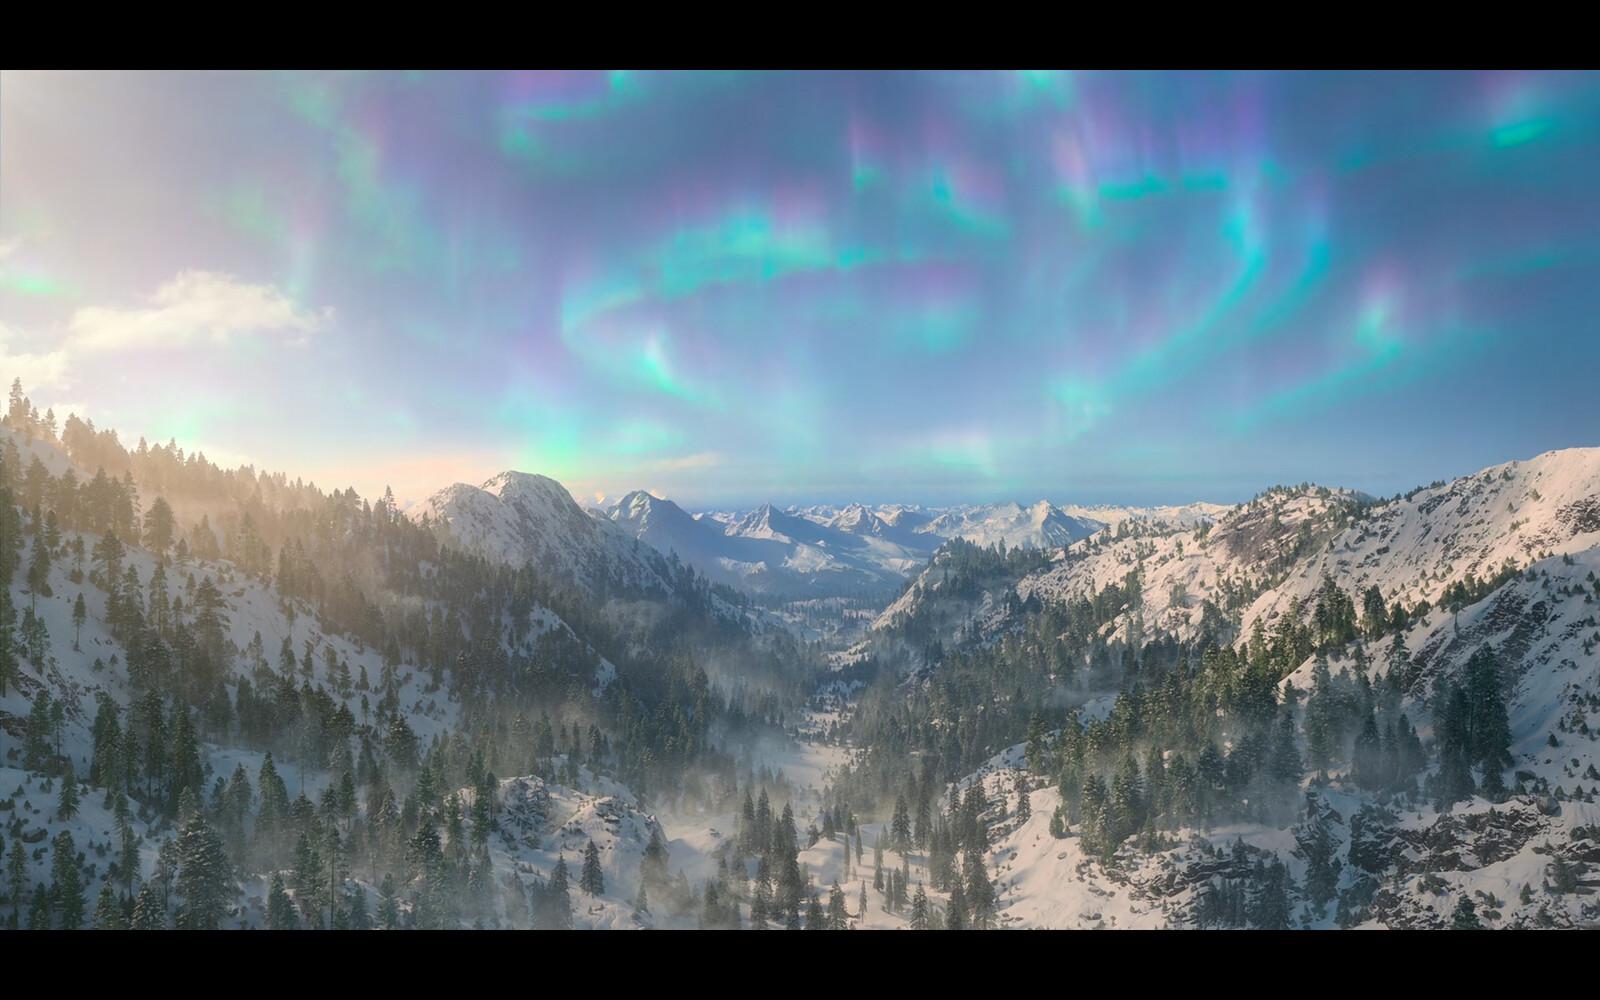 The artic wilderness environment where Santa is chasing Jola